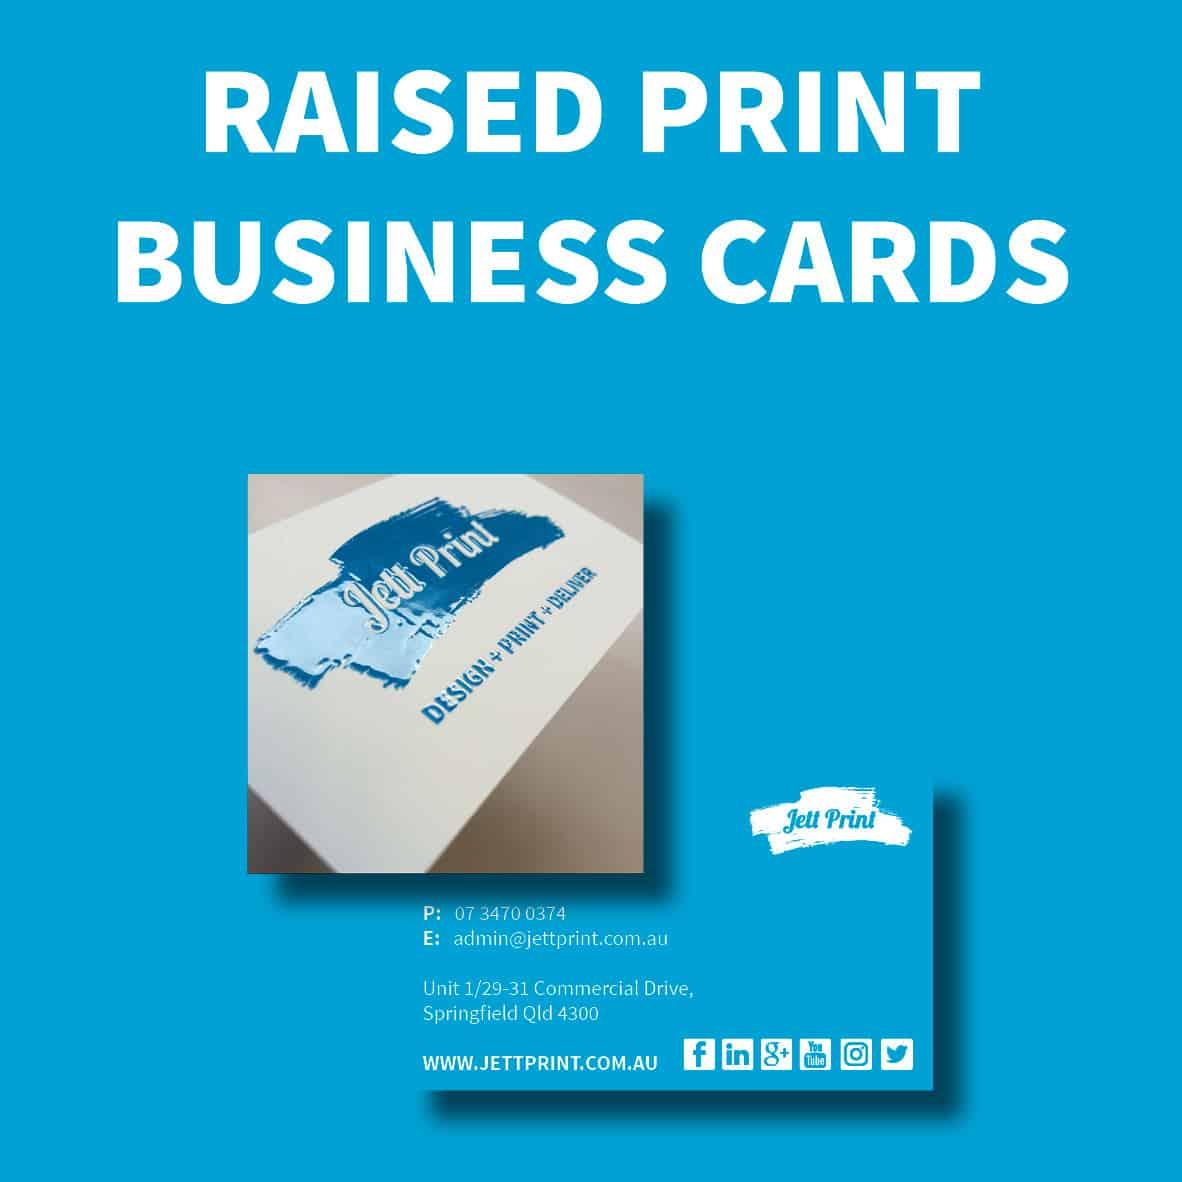 raised-print-business-cards-printing-springfield-ipswich-brisbane15